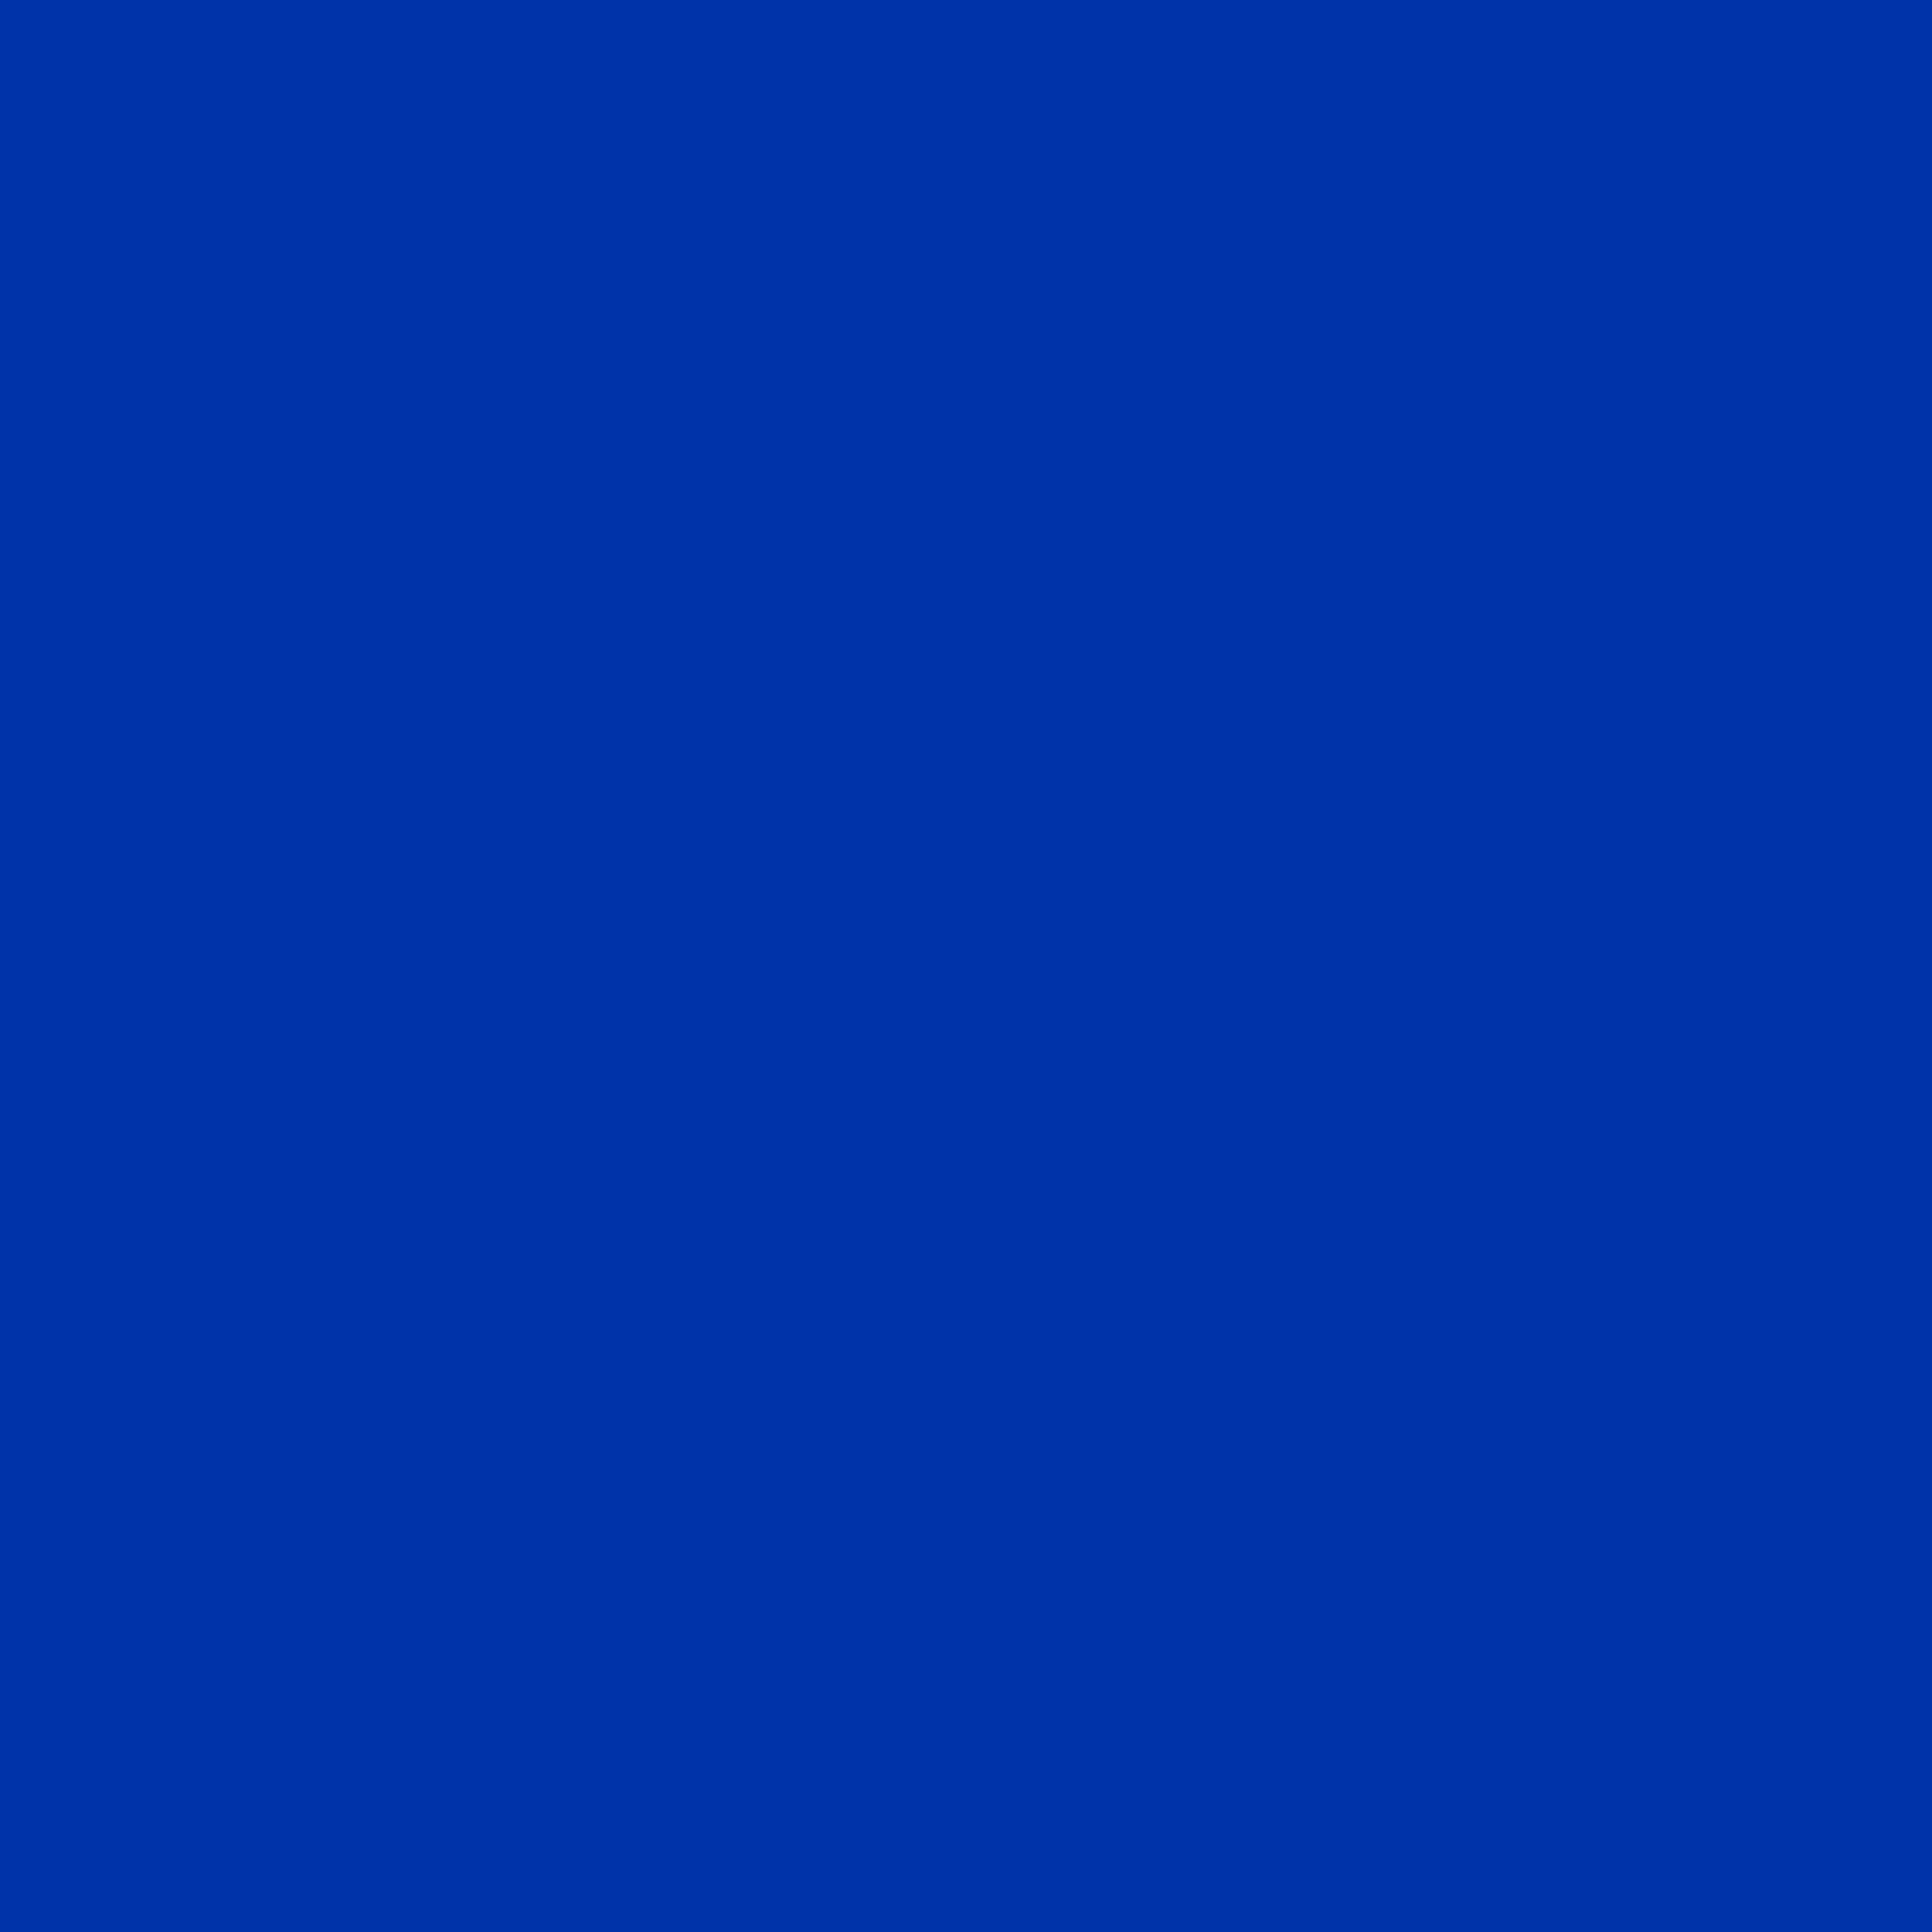 2048x2048 UA Blue Solid Color Background